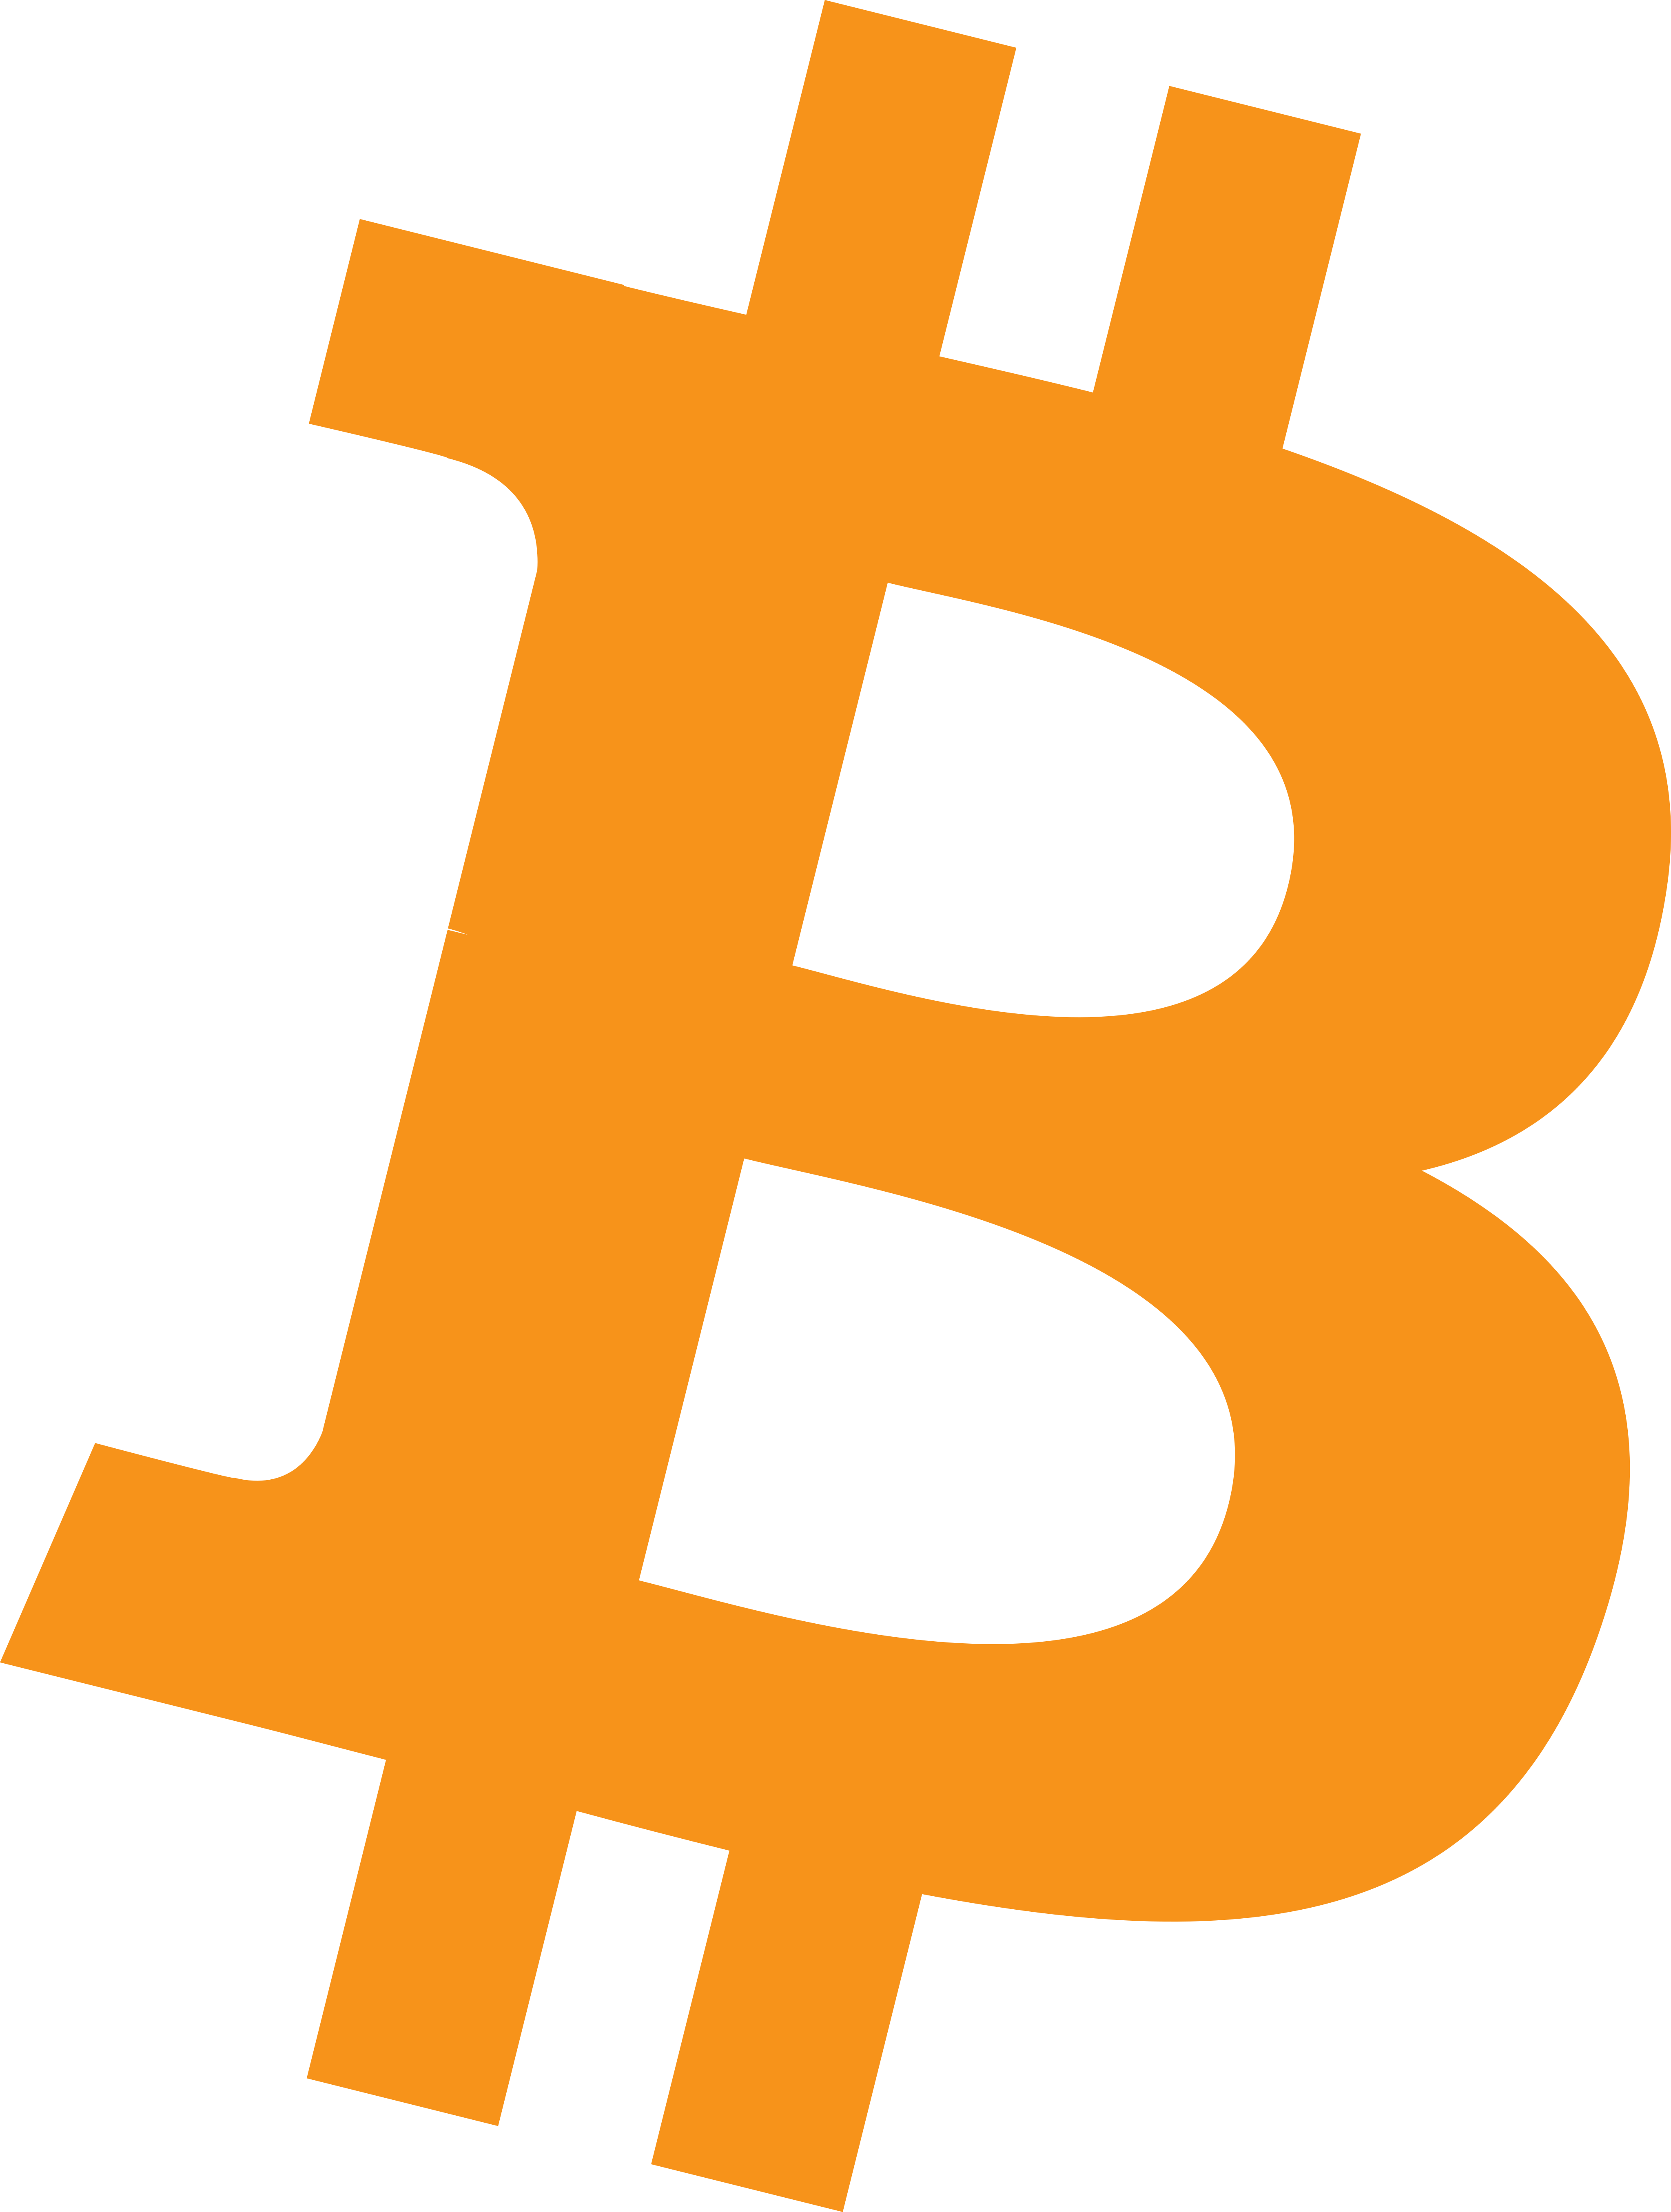 bitcoin logo 6 1 - Bitcoin Logo